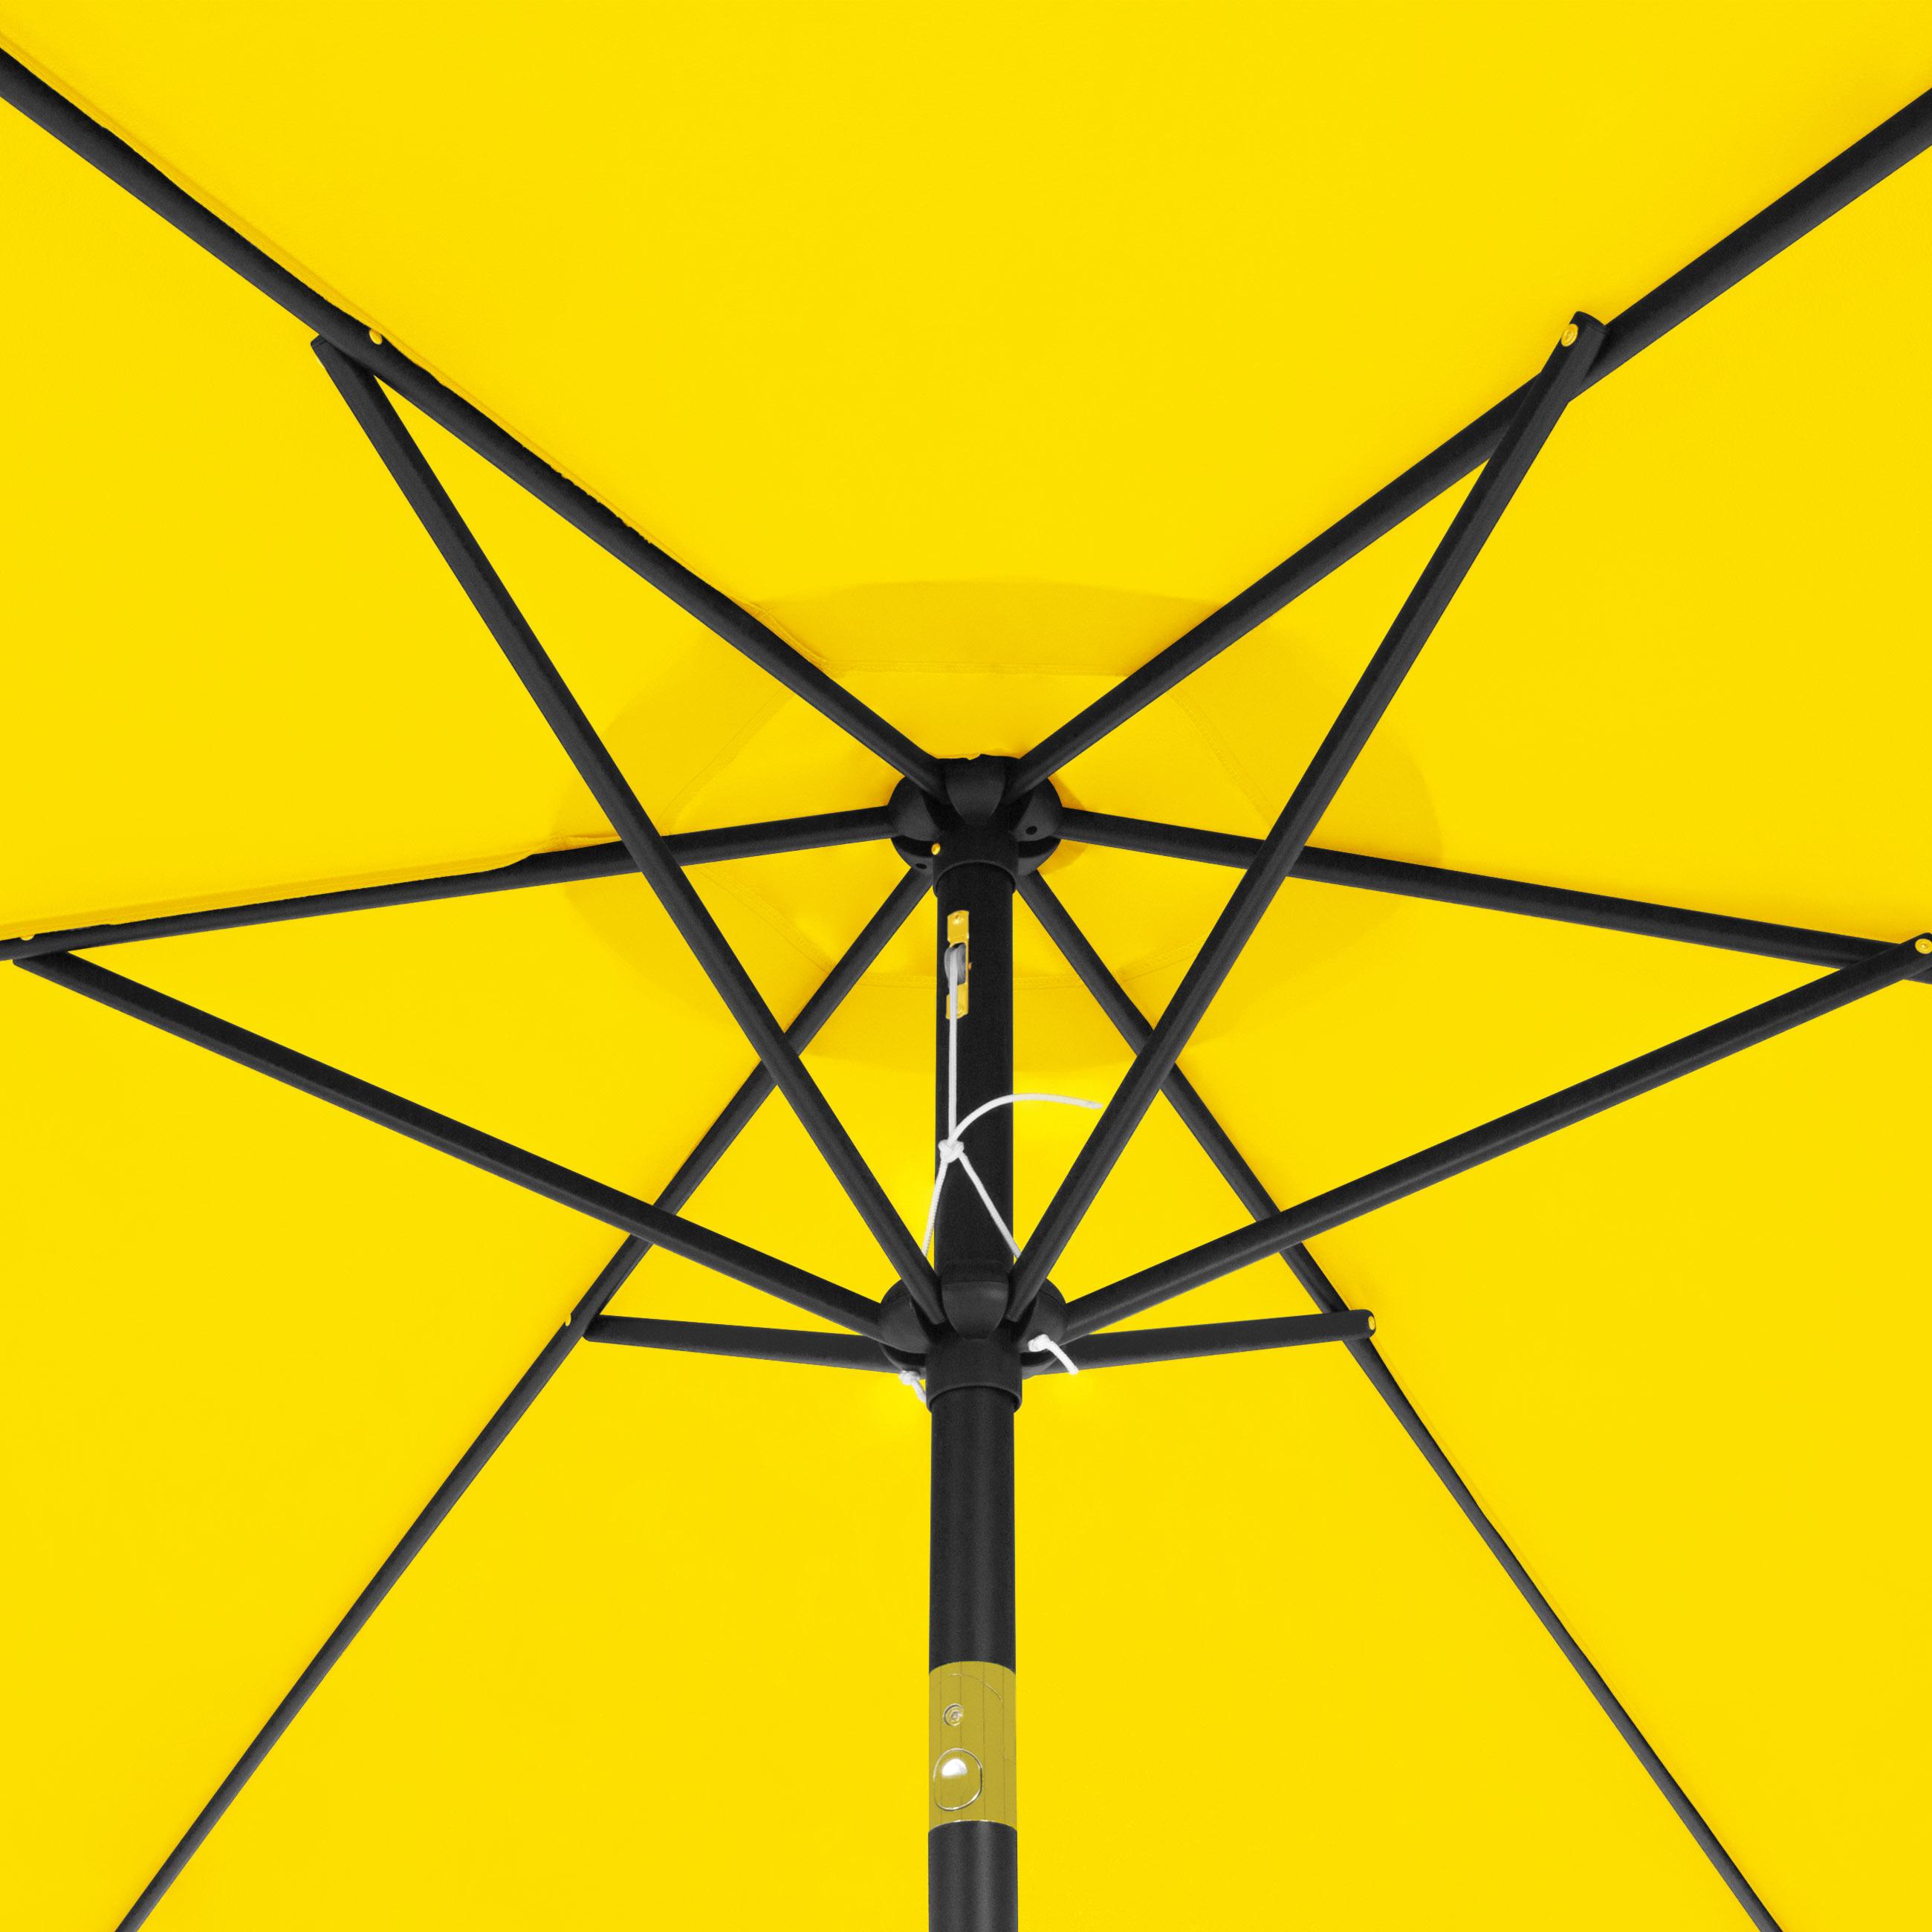 BCP-10ft-Outdoor-Steel-Market-Patio-Umbrella-Decoration-w-Tilt-Crank thumbnail 68